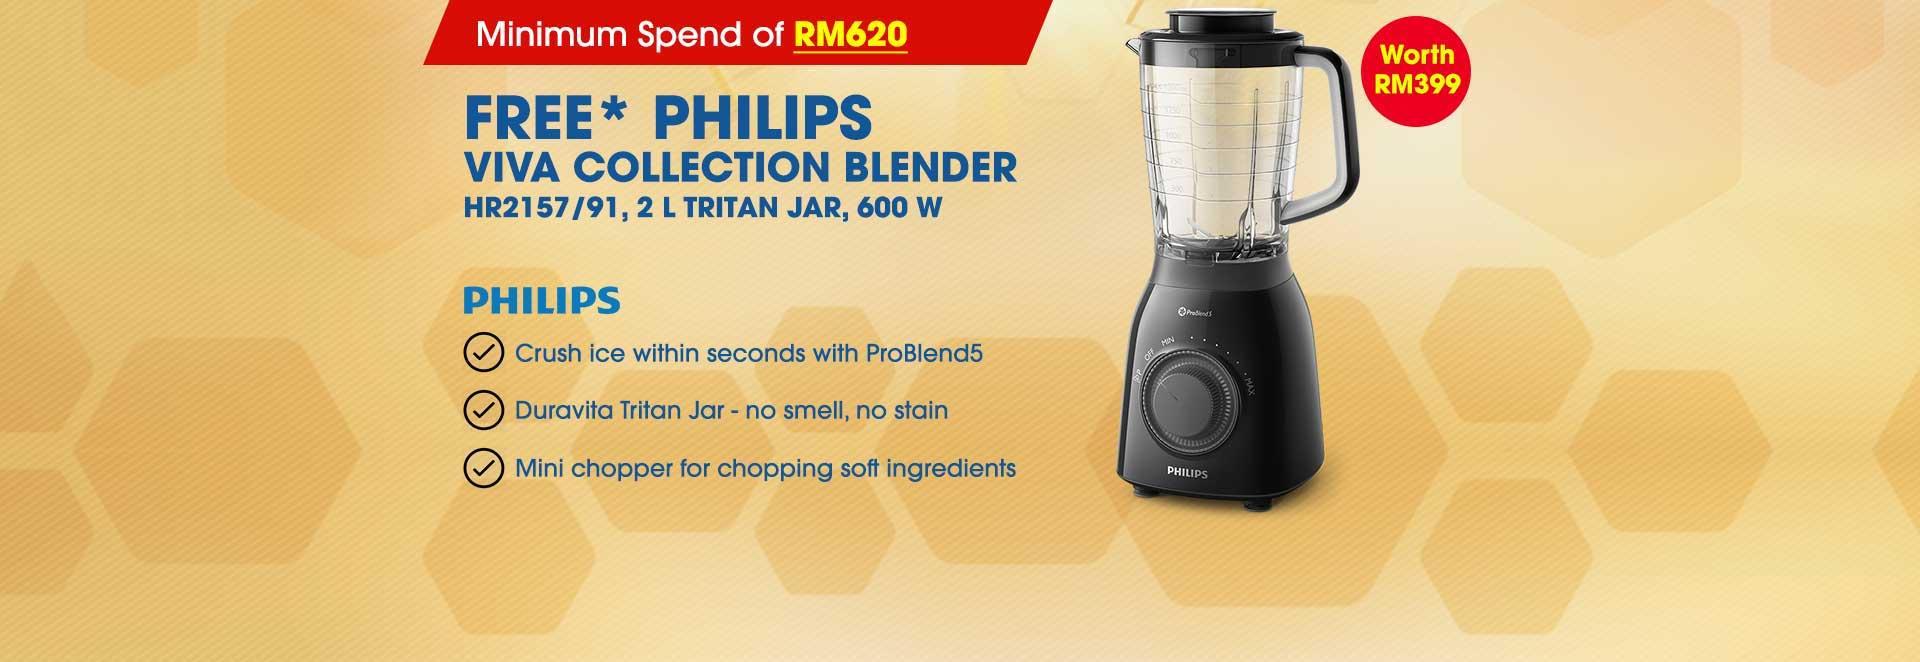 free philips viva collection blender